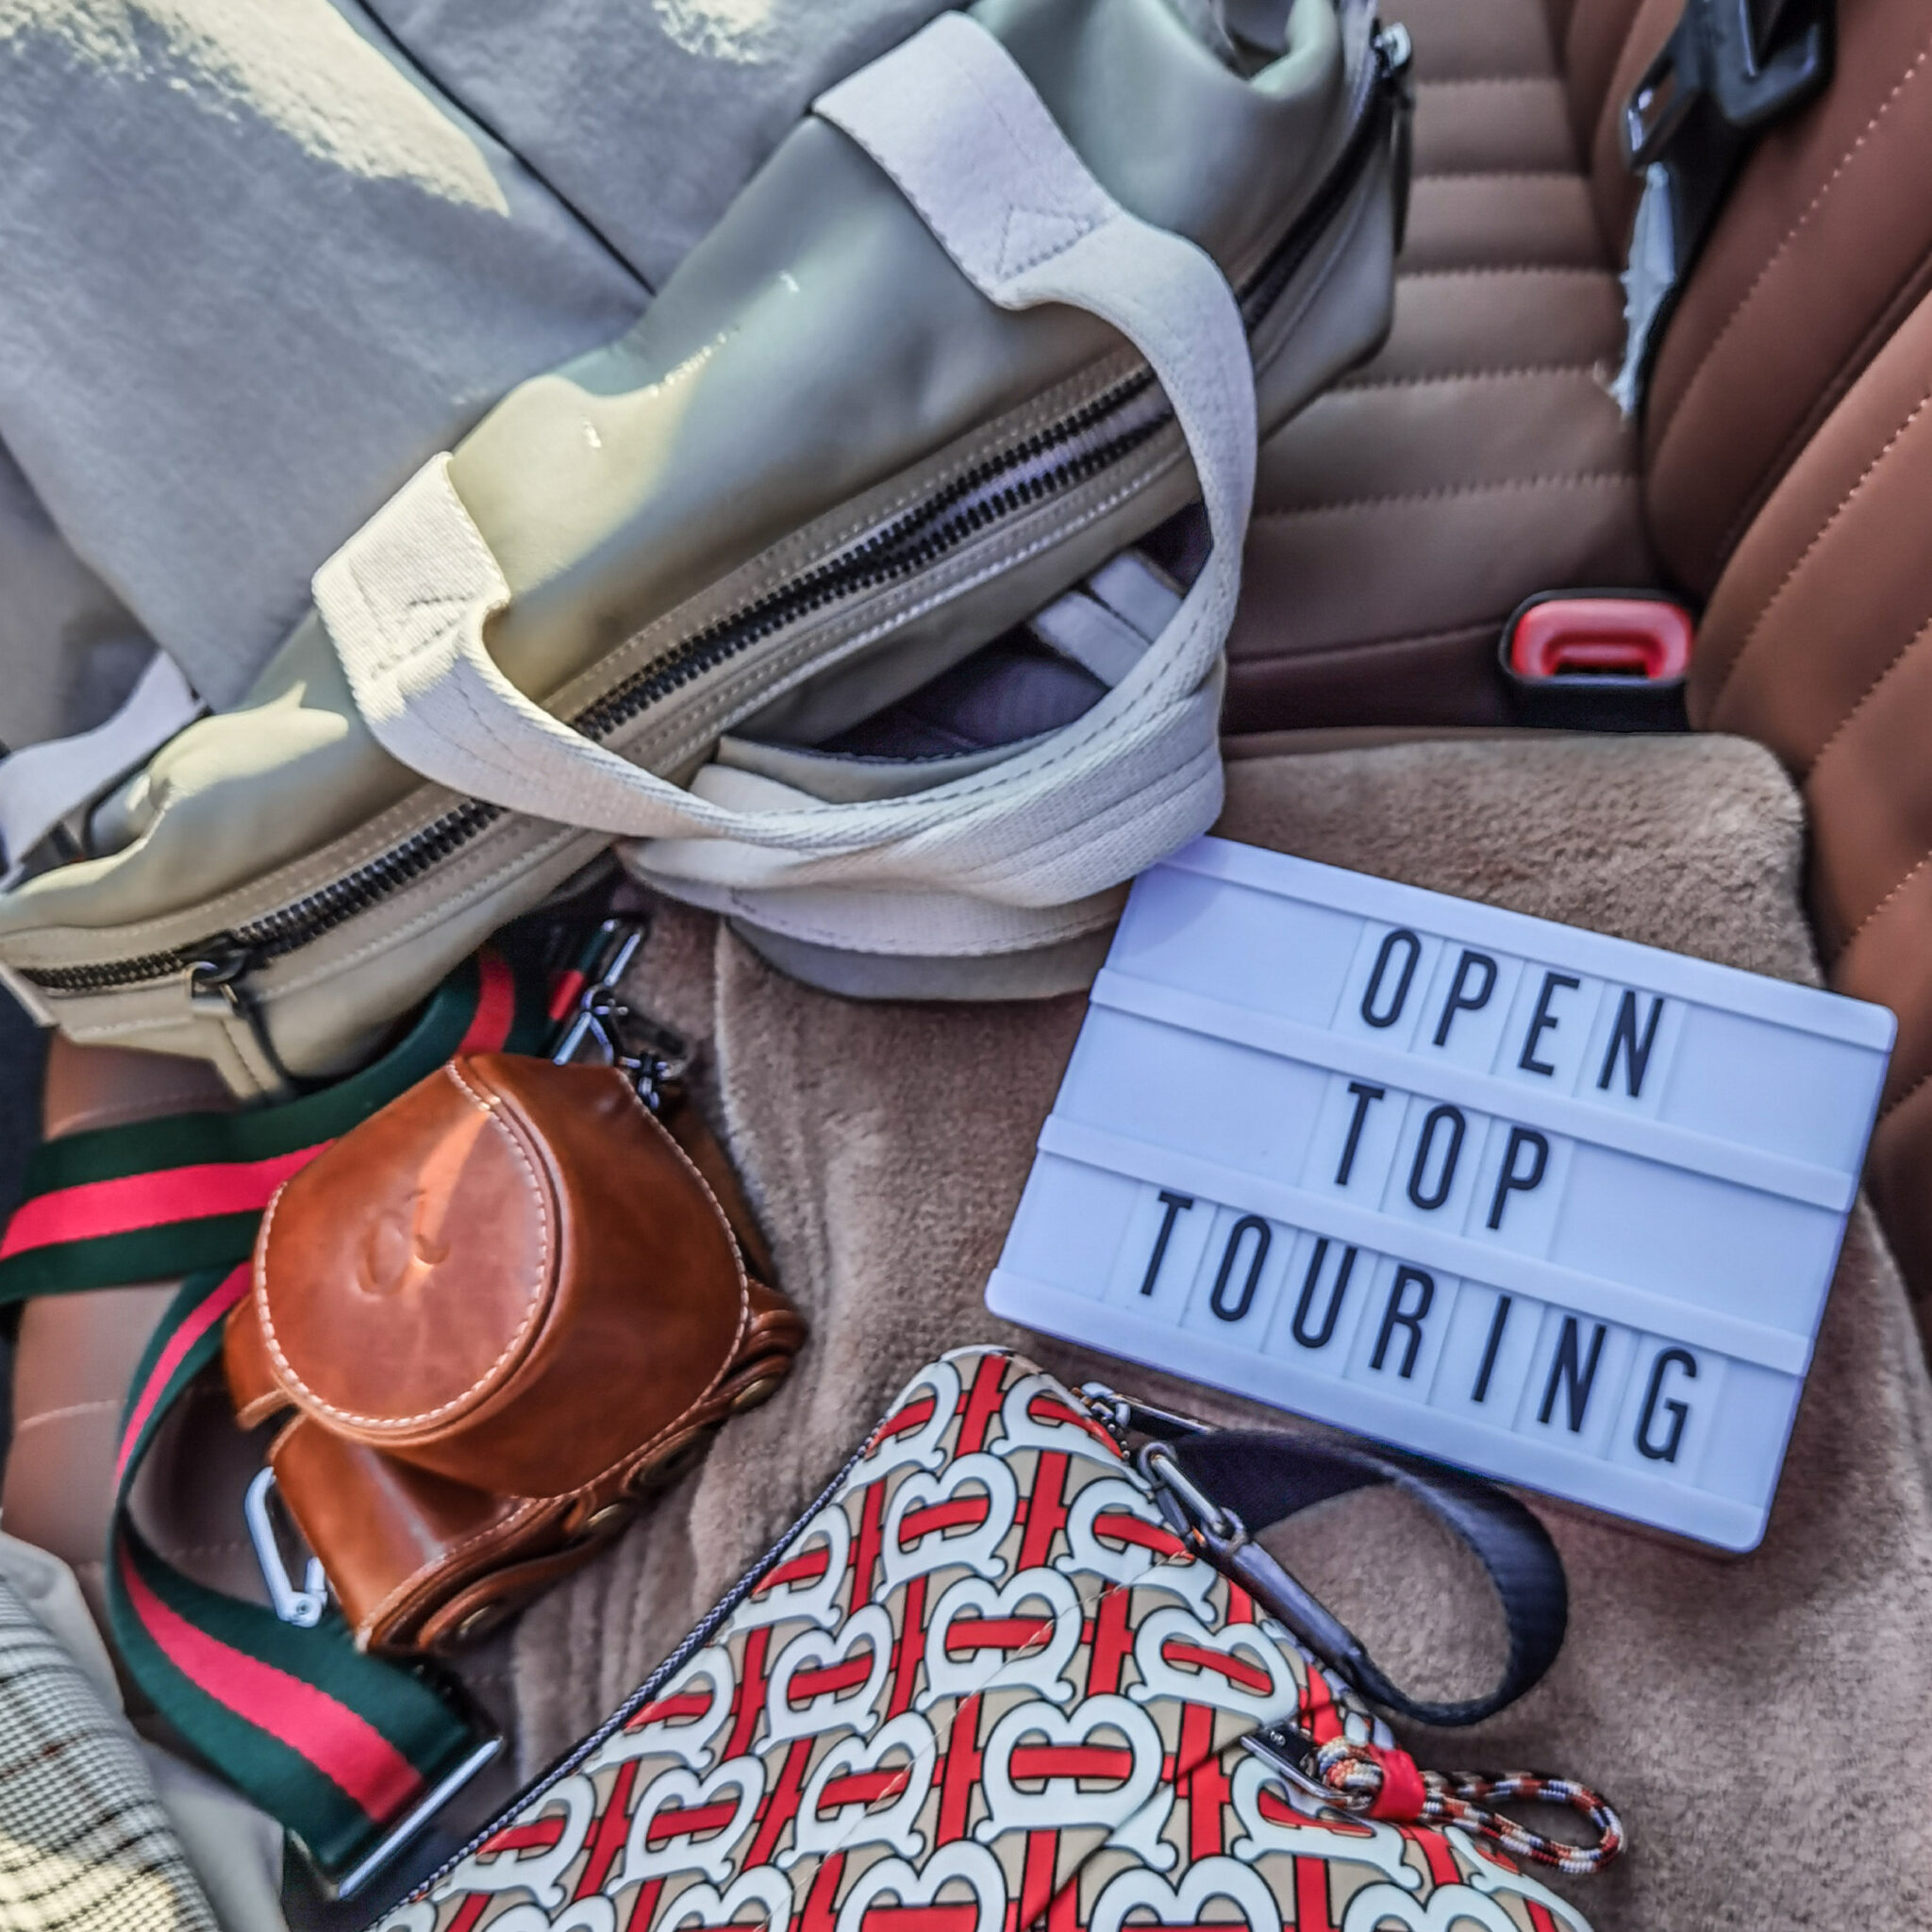 Mount Royal Hotel - Pursuit - Banff - Canadian Rockies - Open Top Touring - Car Flatlay